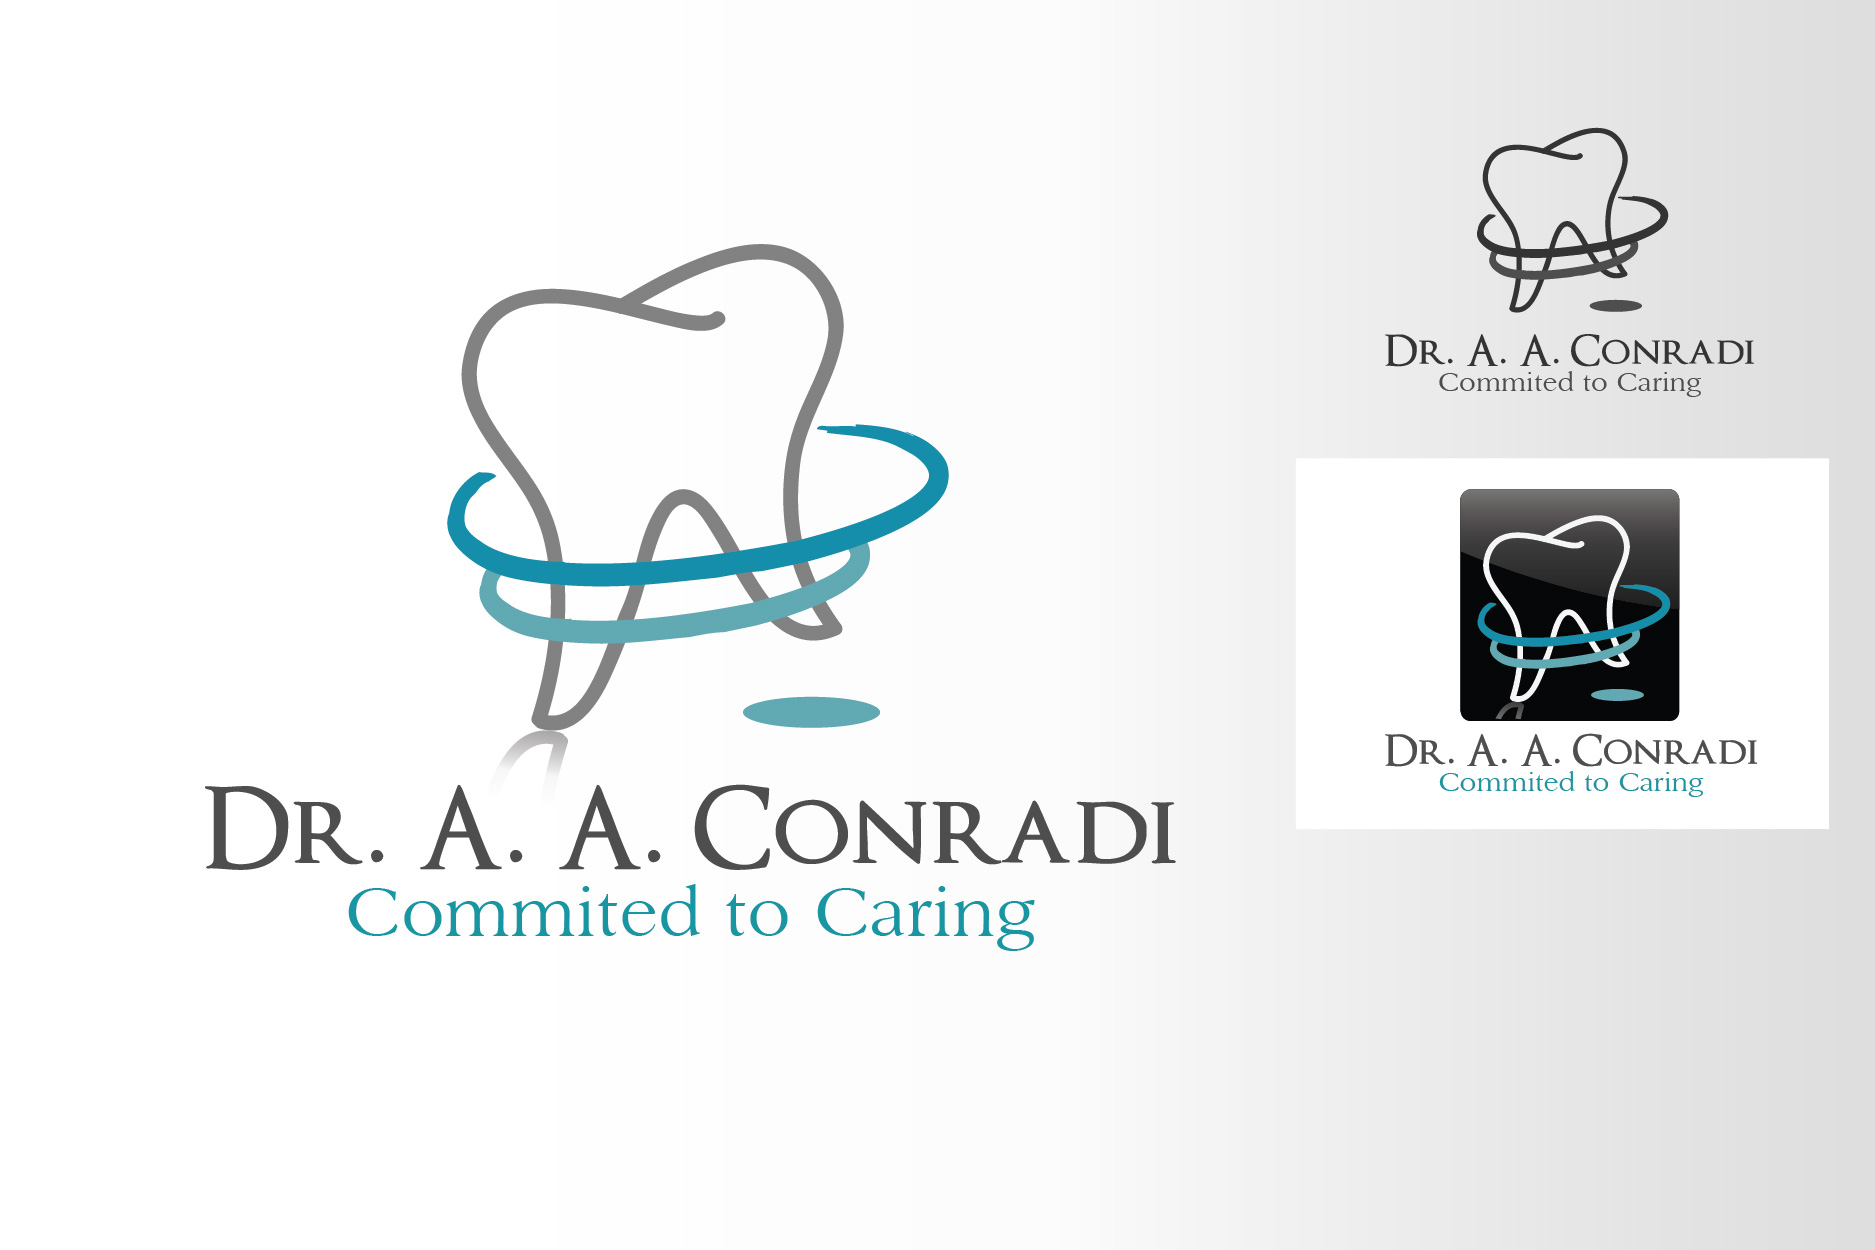 Logo Design by Private User - Entry No. 94 in the Logo Design Contest Unique Logo Design Wanted for Dr. A.A. Conradi.